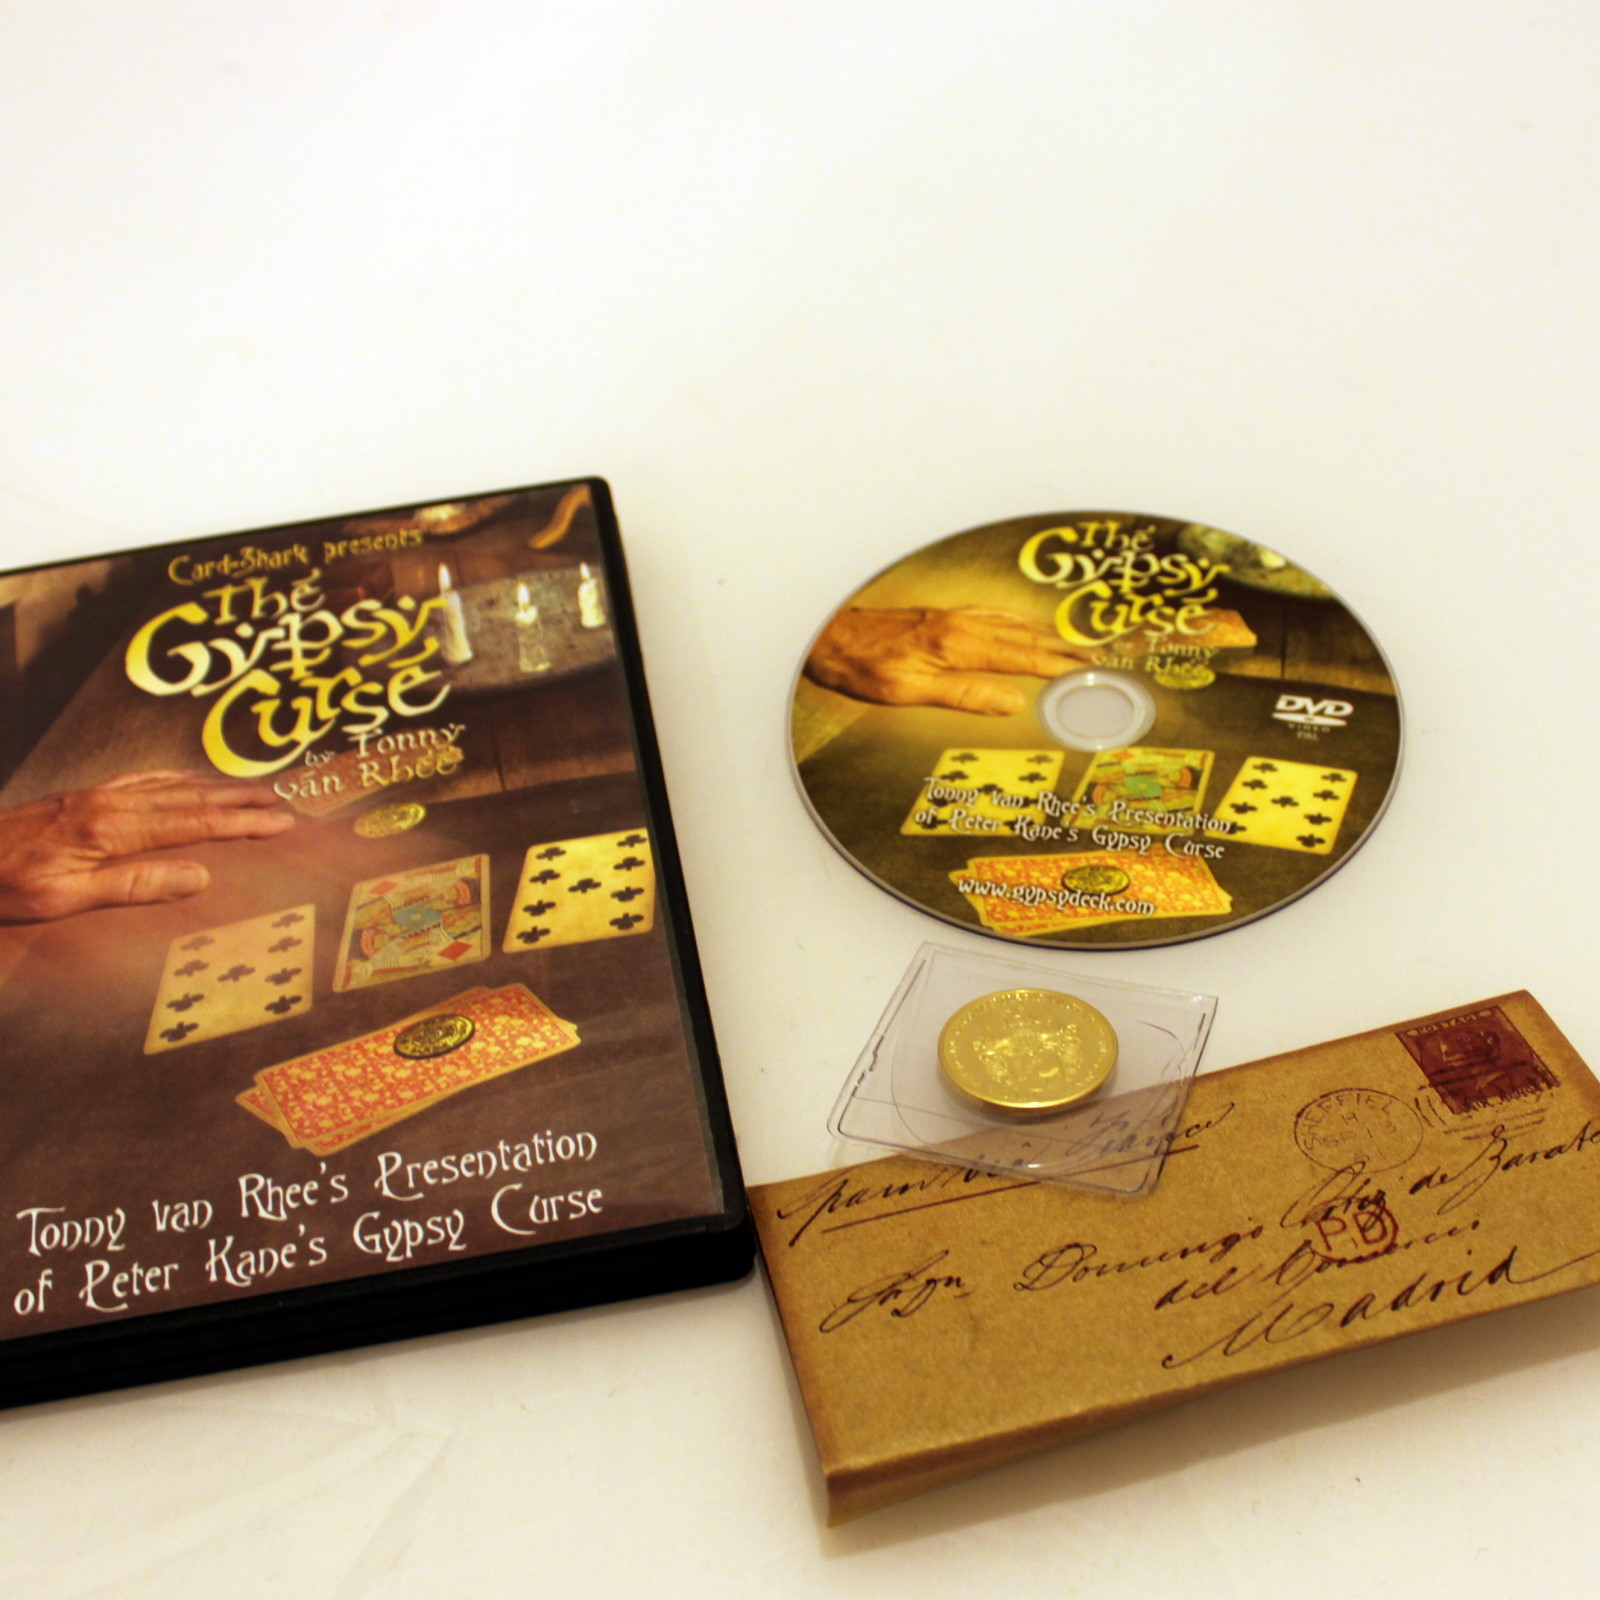 Gypsy Curse (CardShark) by Tonny Van Rhee